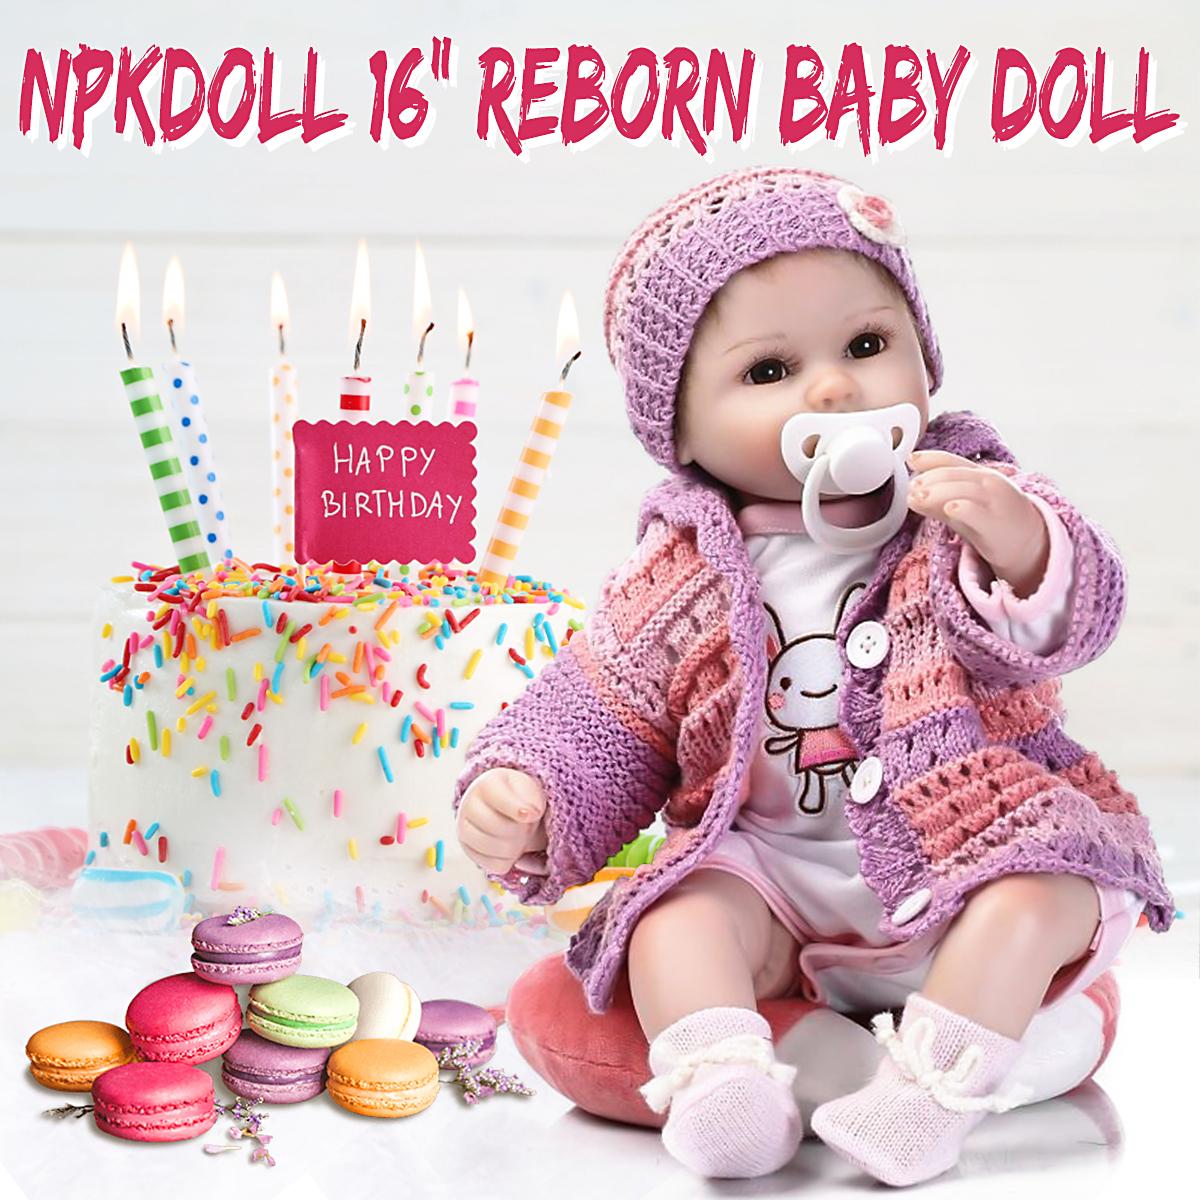 Realistic 40cm Newborn Handmade Lifelike Newborn Baby Doll Reborn Soft Silicone Vinyl Hair Rooted Gift for Girl